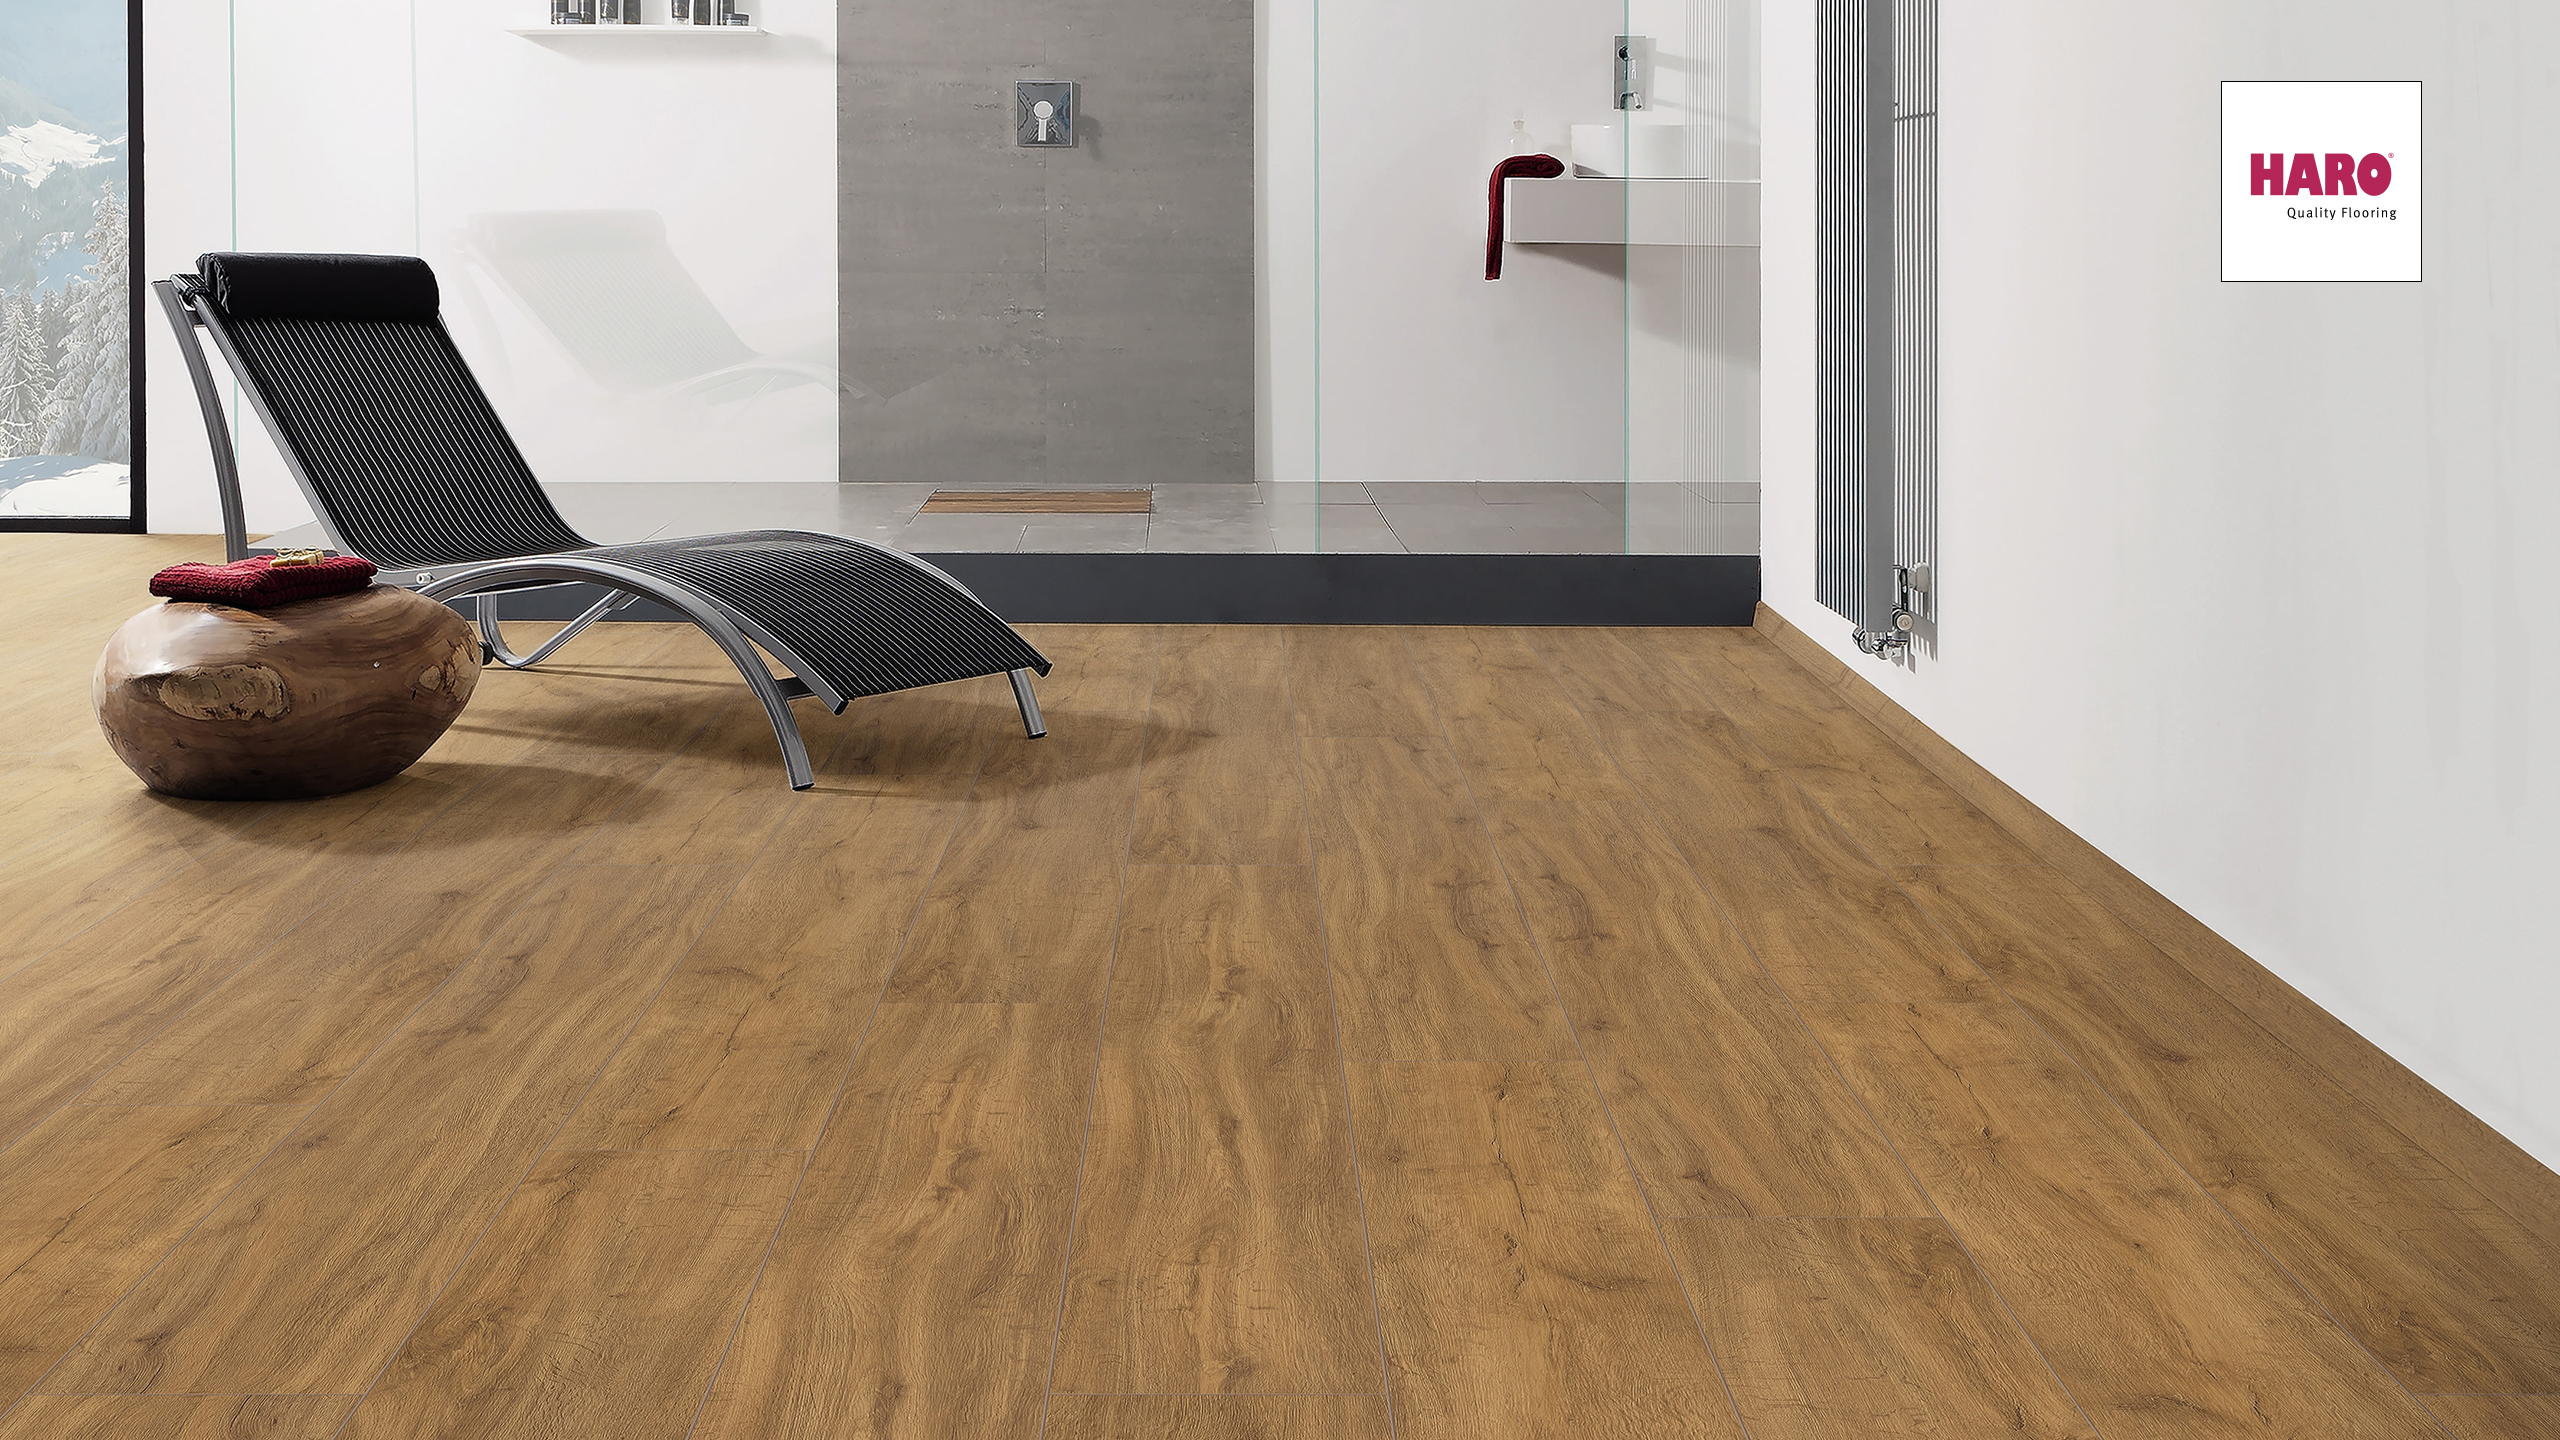 seite 4 vinylboden auf hdf tr ger 8 0 bis 9 3 mm dick. Black Bedroom Furniture Sets. Home Design Ideas